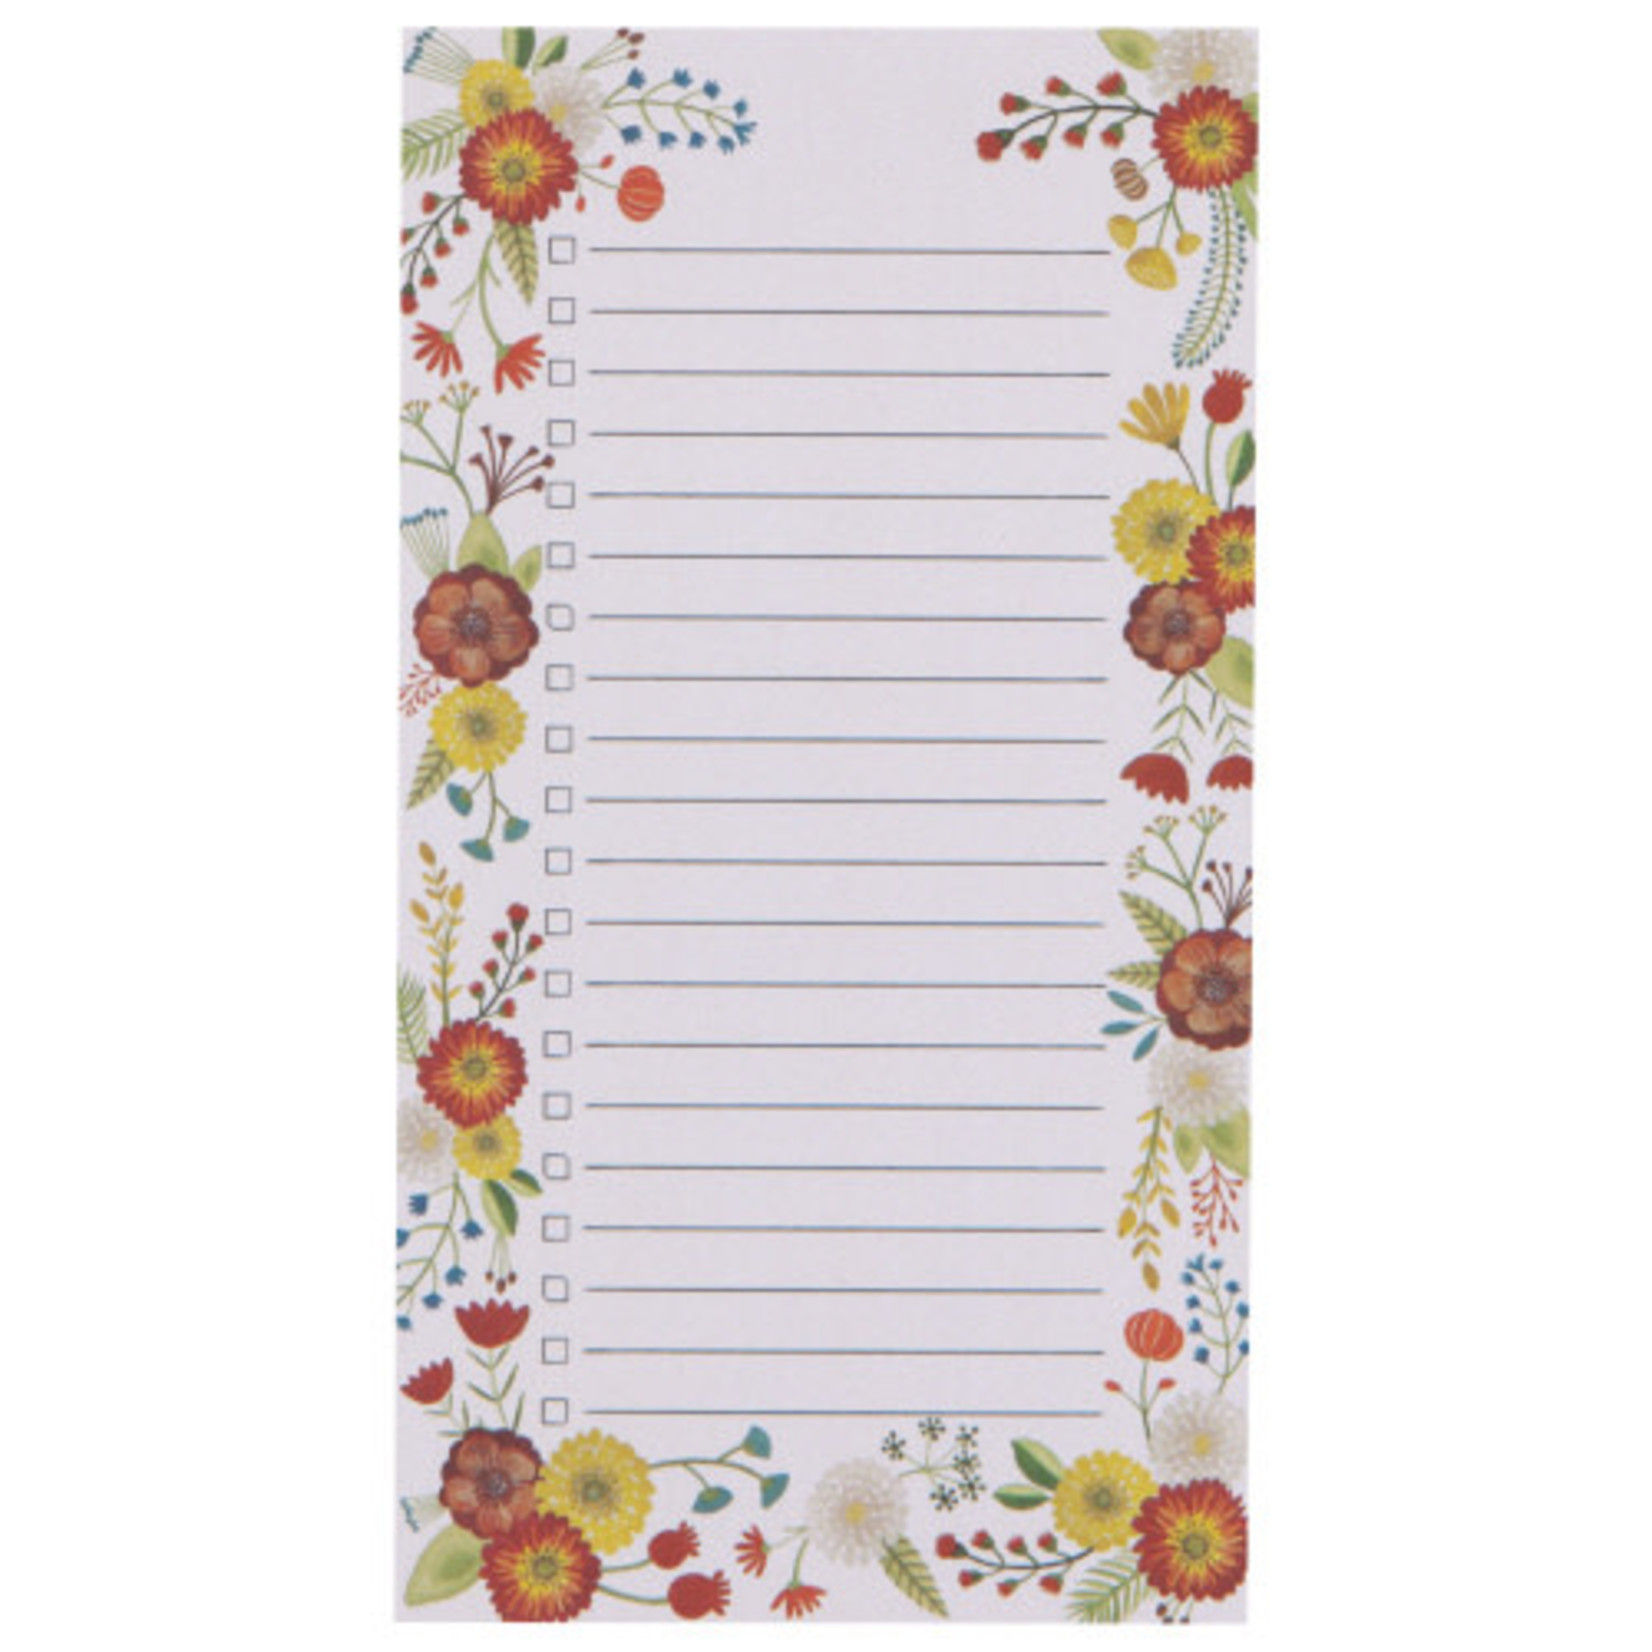 List It Notepad Goldenbloom